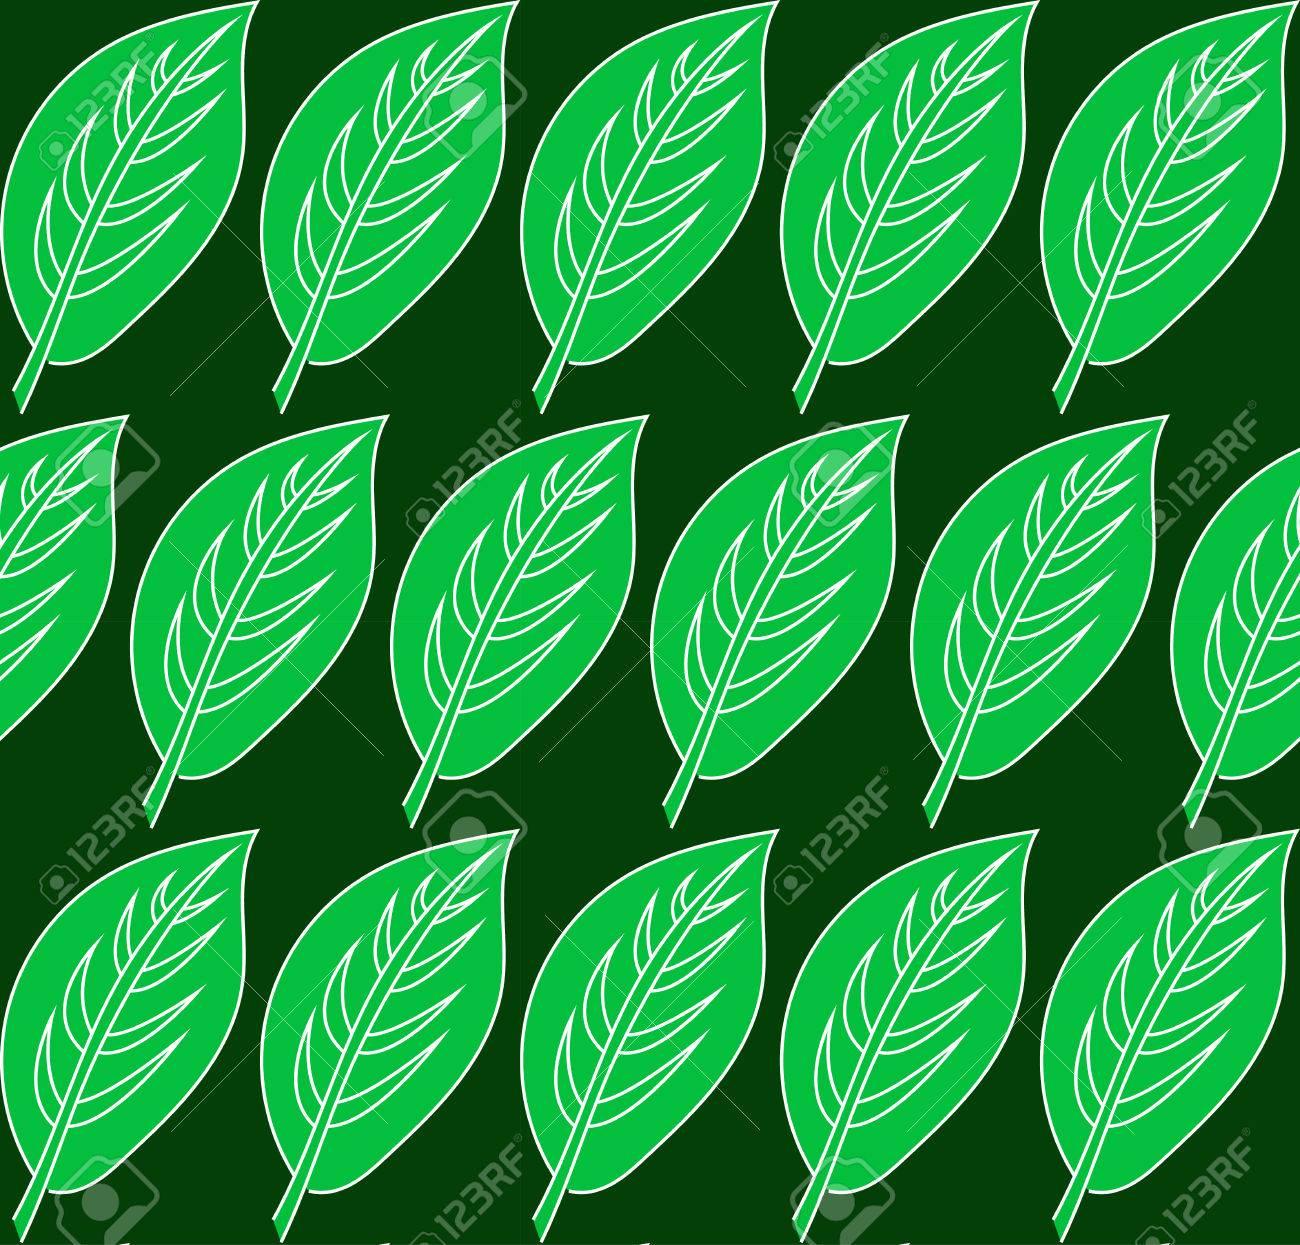 Motif De Feuille Verte Vector Seamless Patterns Peuvent Etre